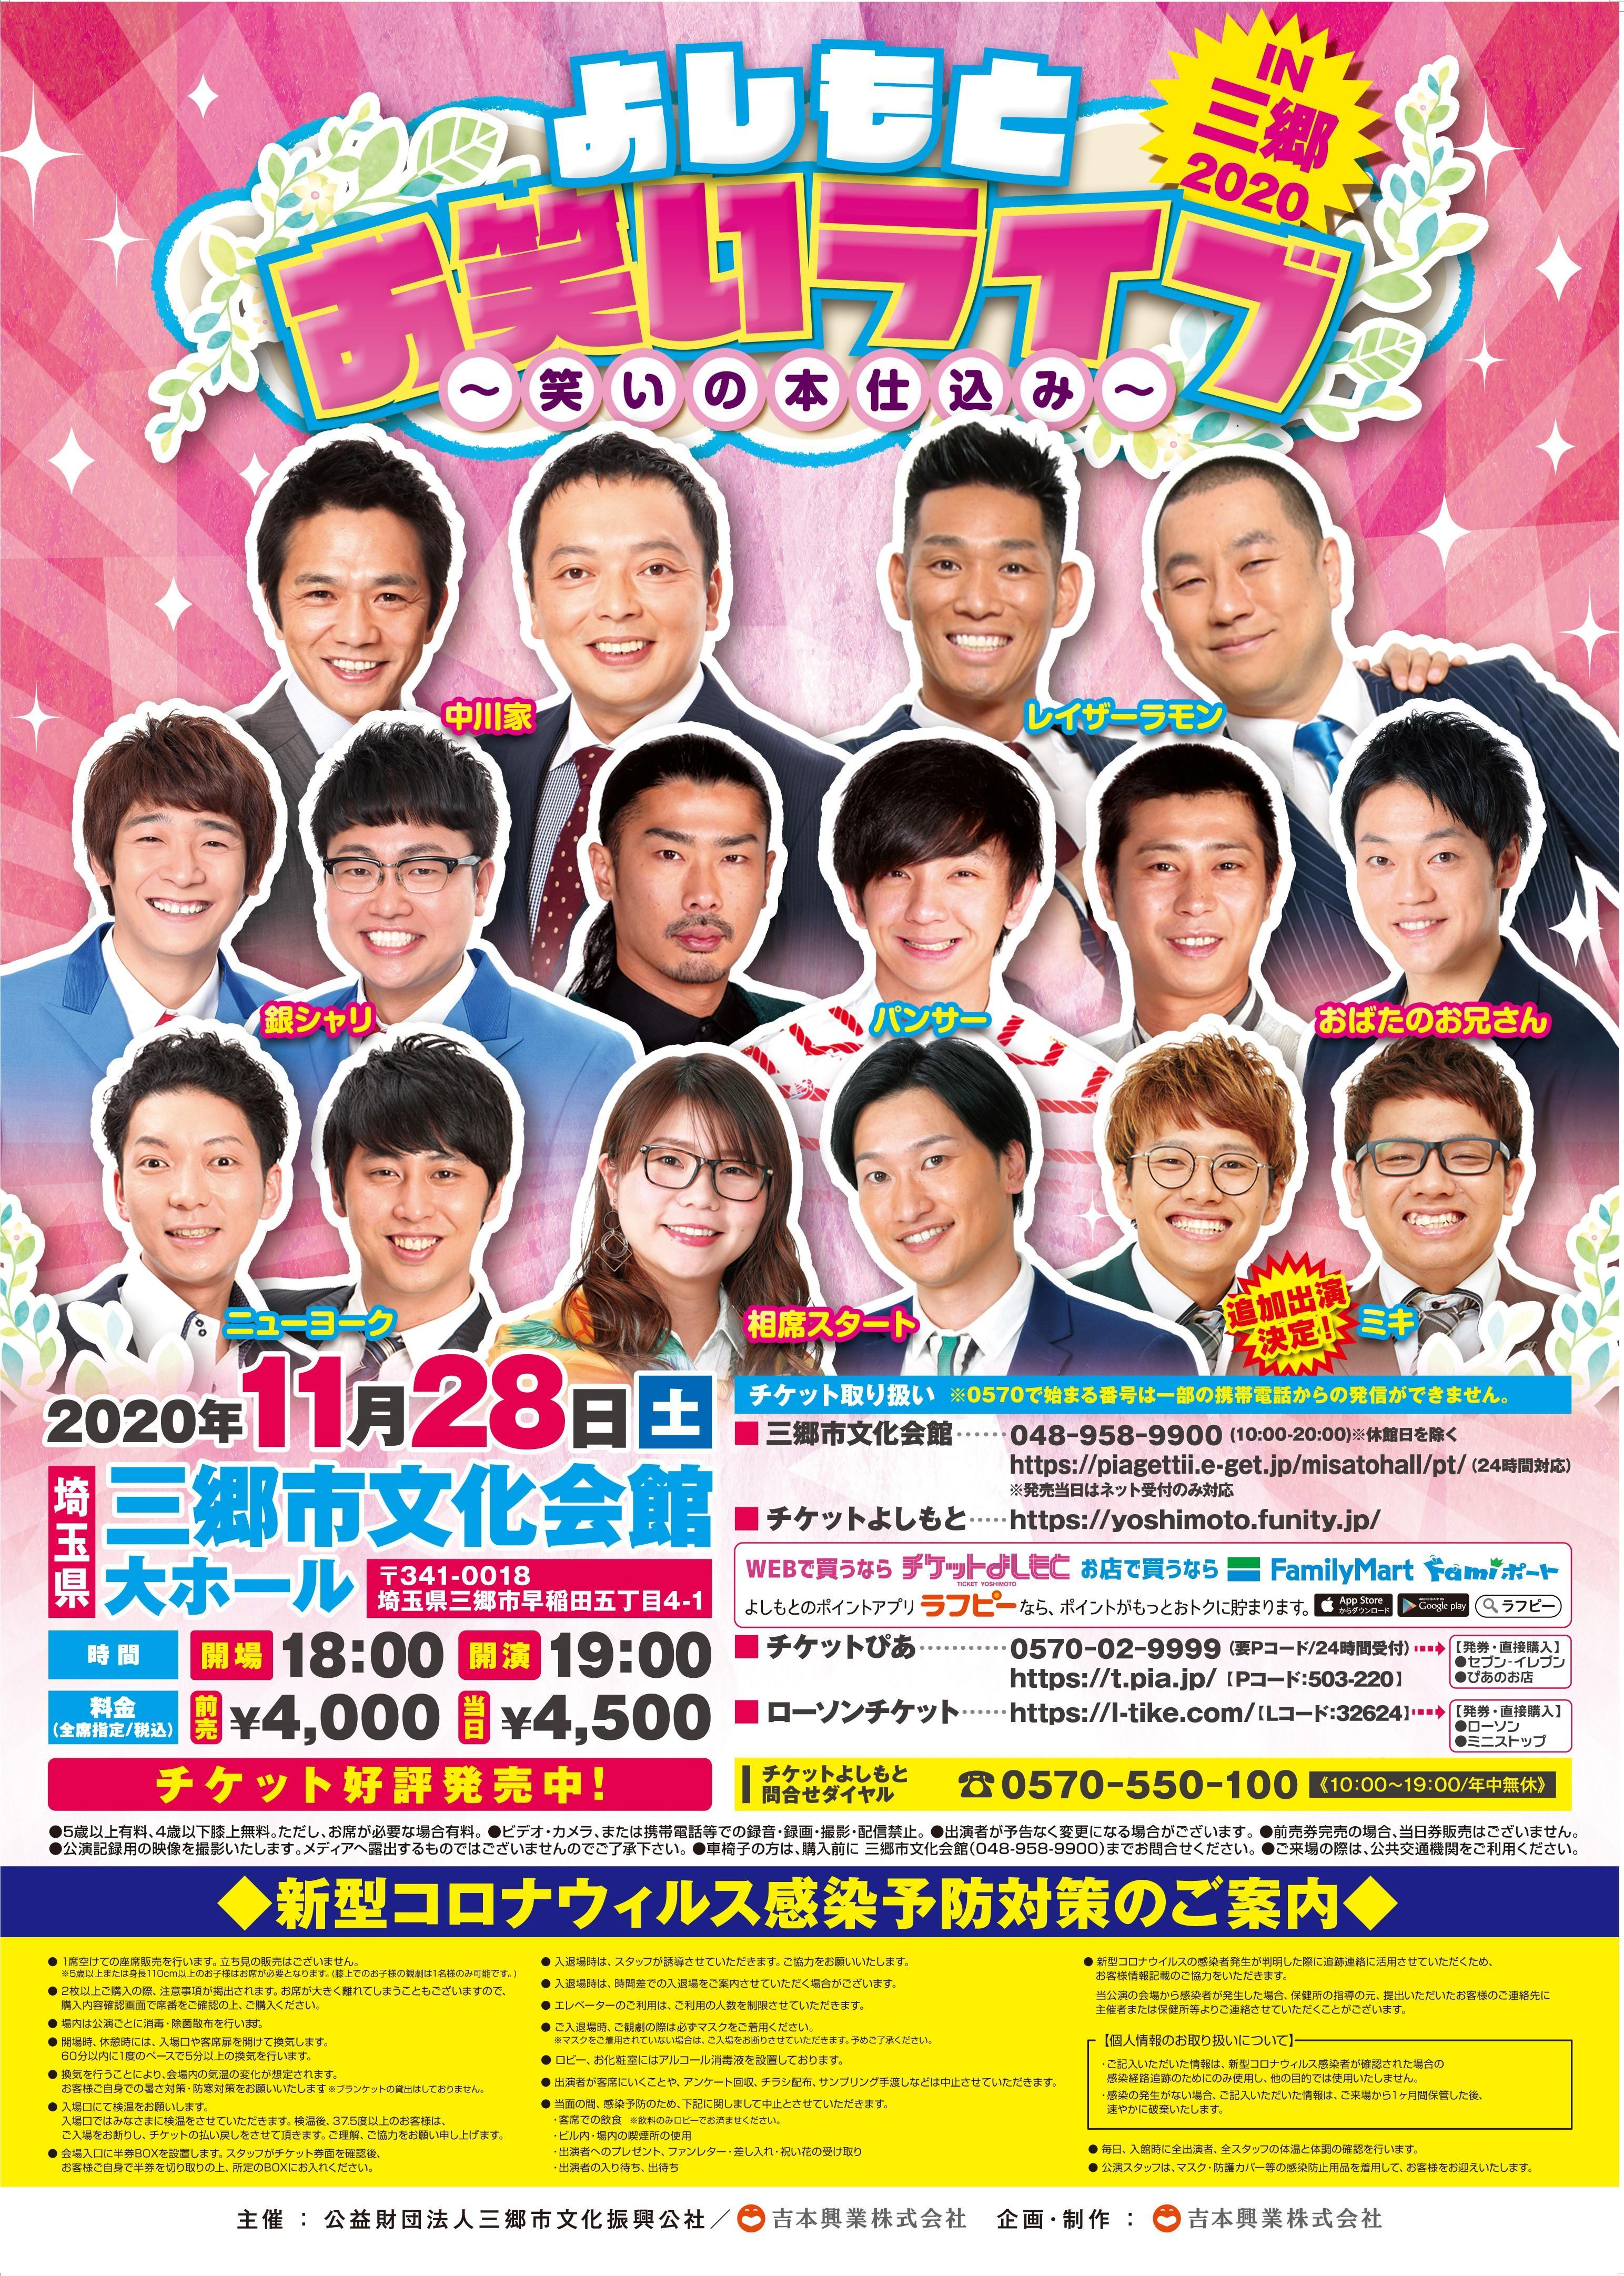 http://www.syumatsu.jp/20201002111646-a18f00f1dee6994441d417608d9425648532a171.jpg